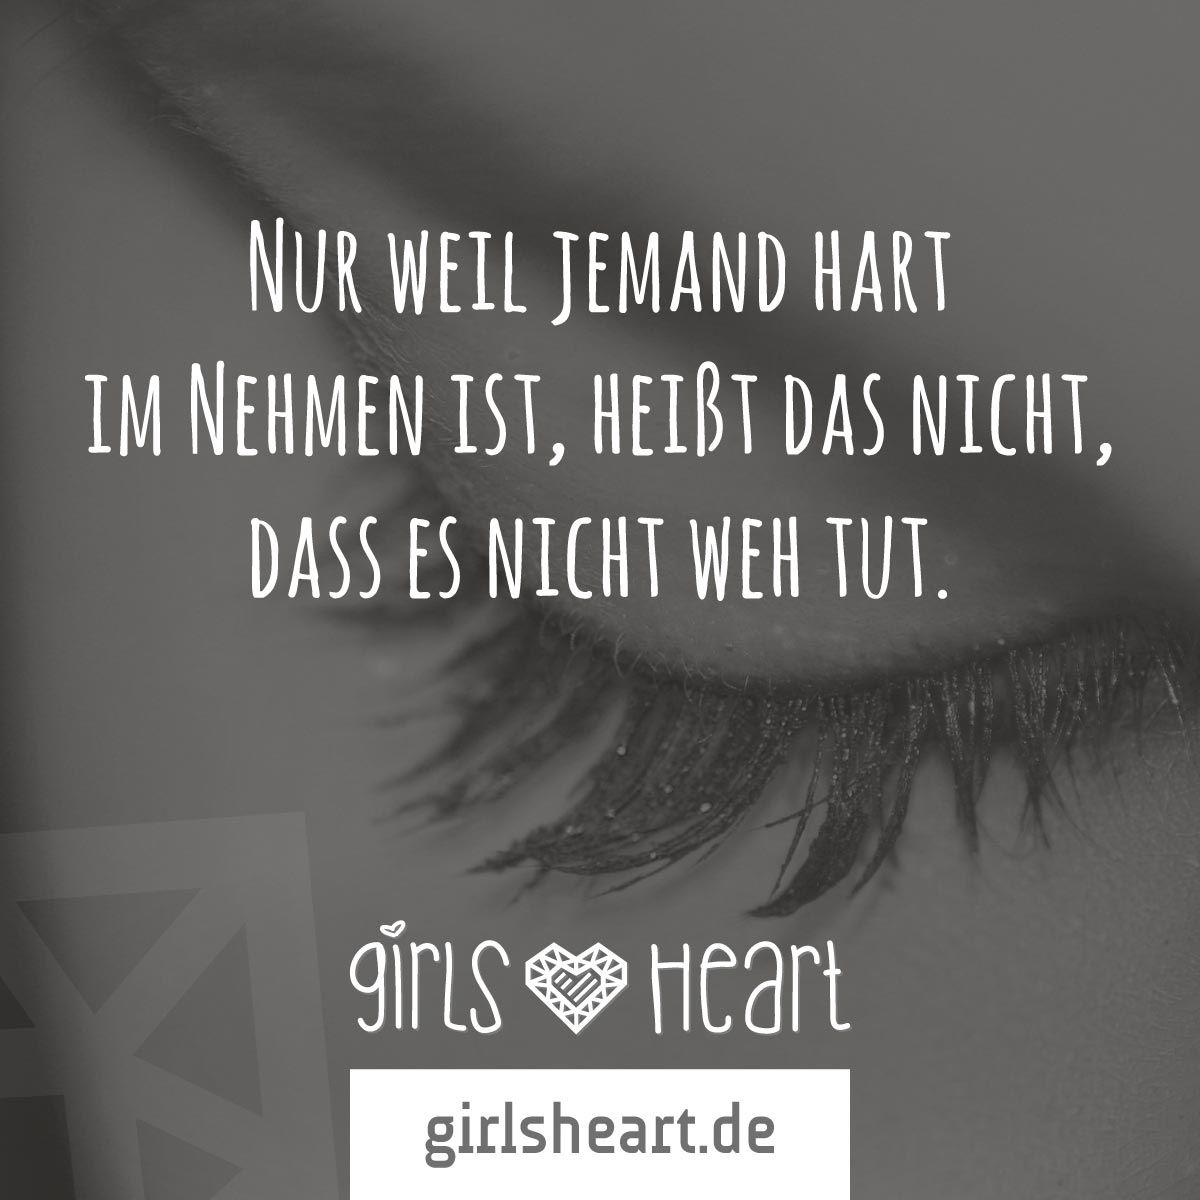 sprüche enttäuschung wut Mehr Sprüche auf: .girlsheart.de #trauer #ärger #wut  sprüche enttäuschung wut